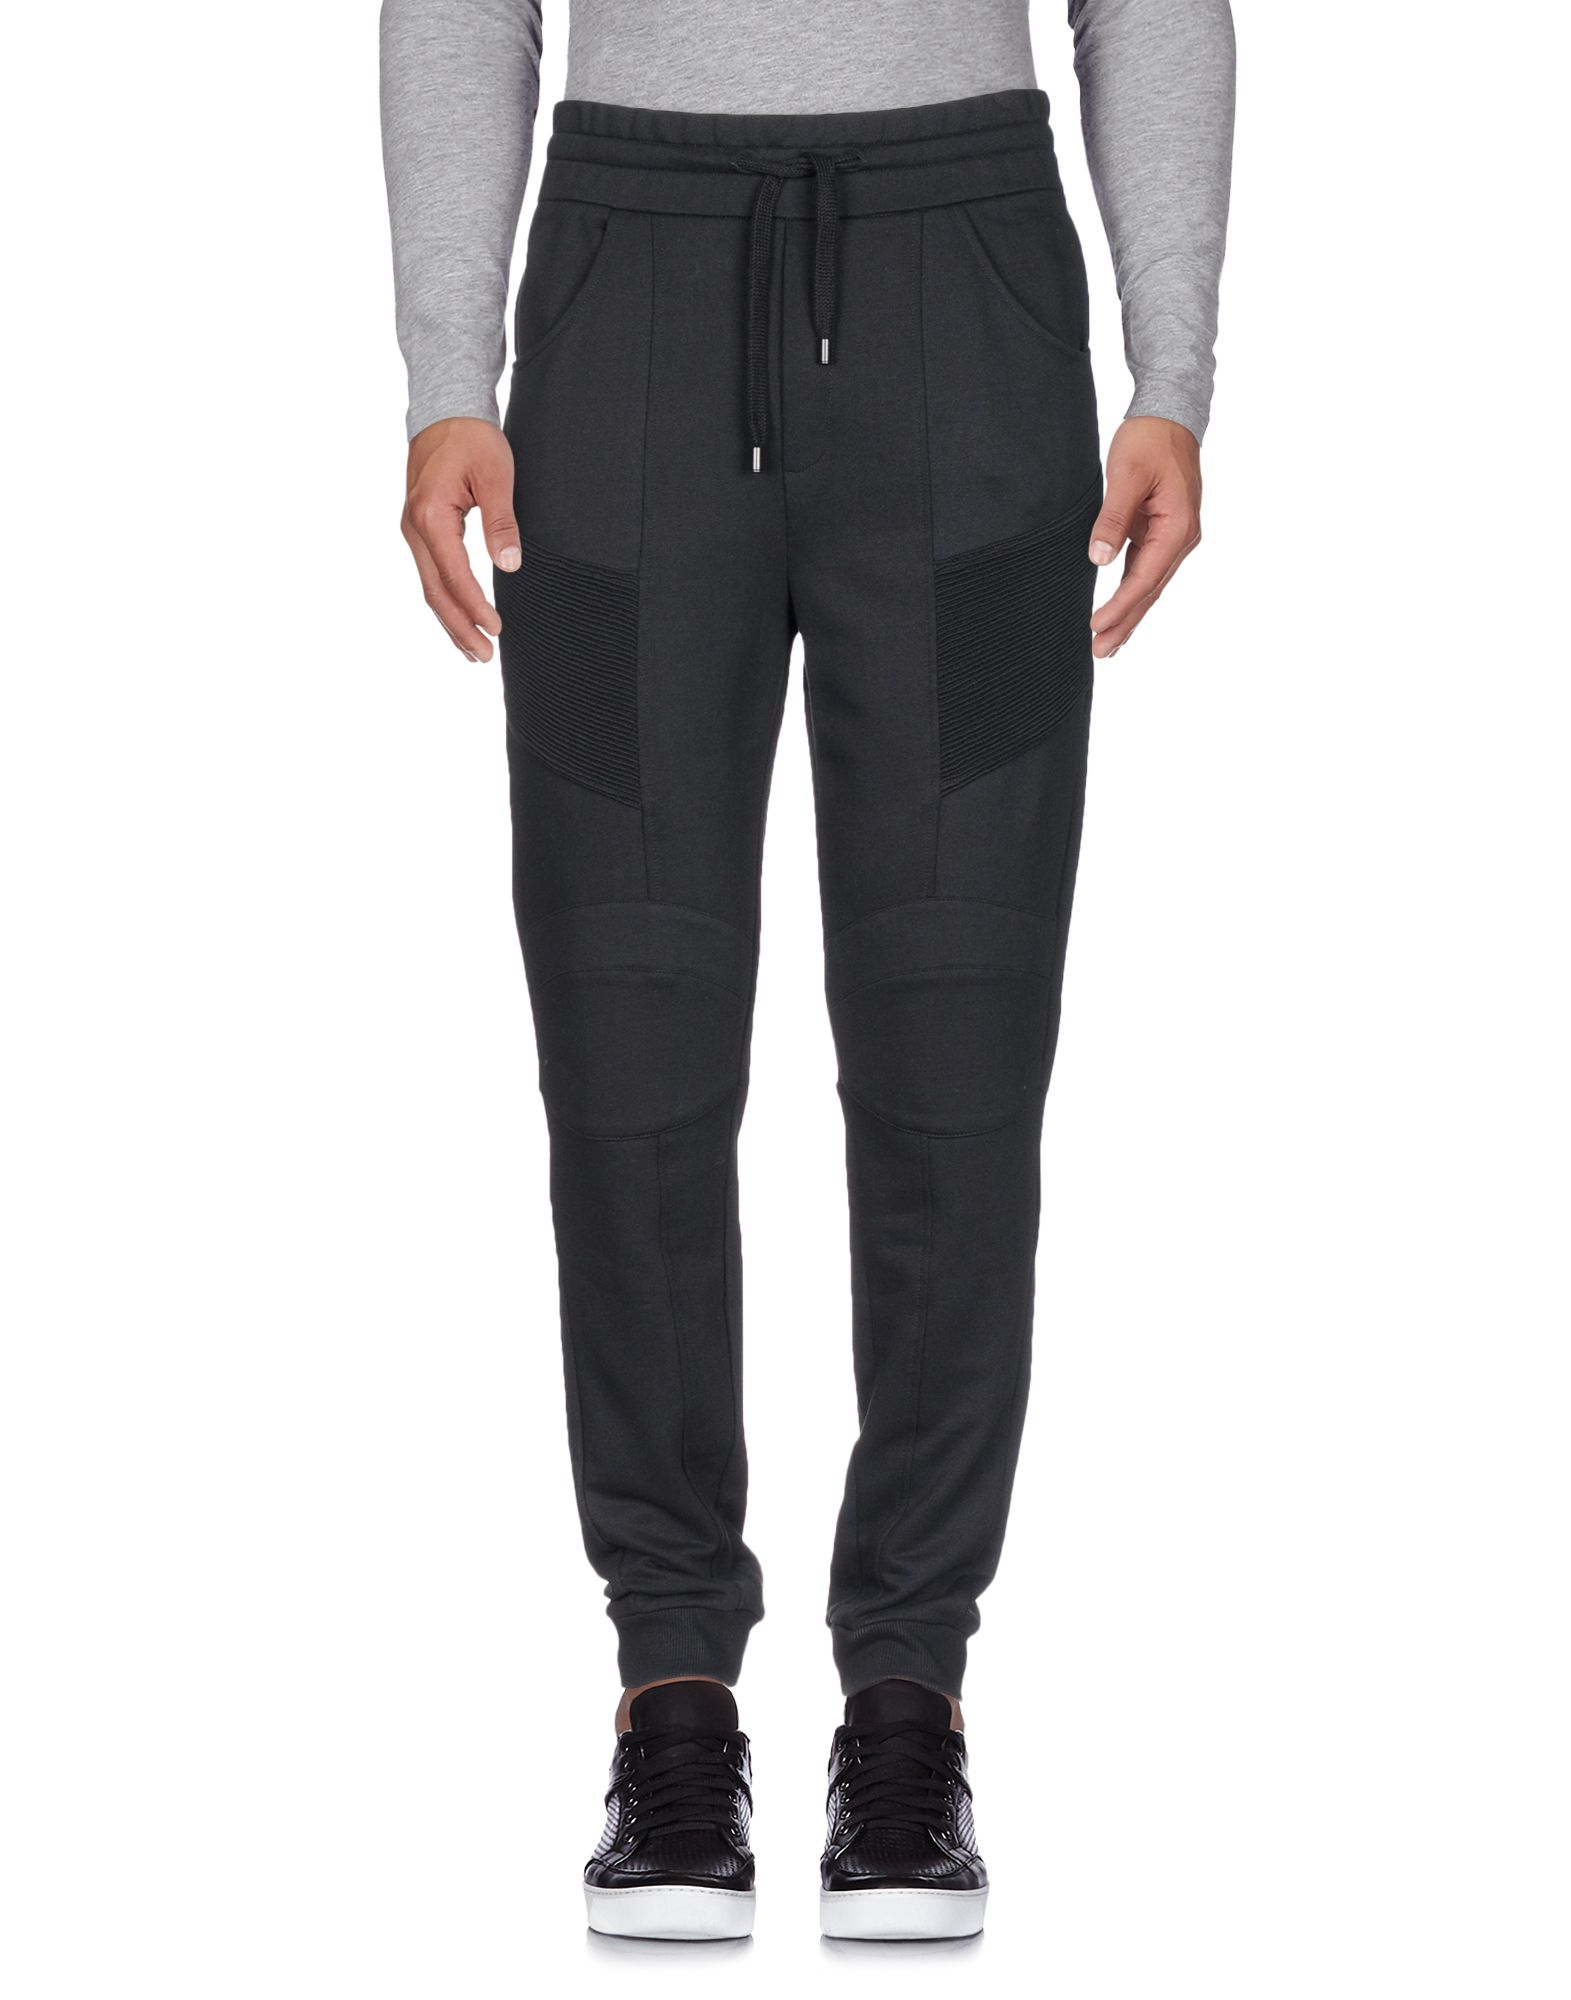 Pantalone Pierre Balmain Donna - Acquista online su